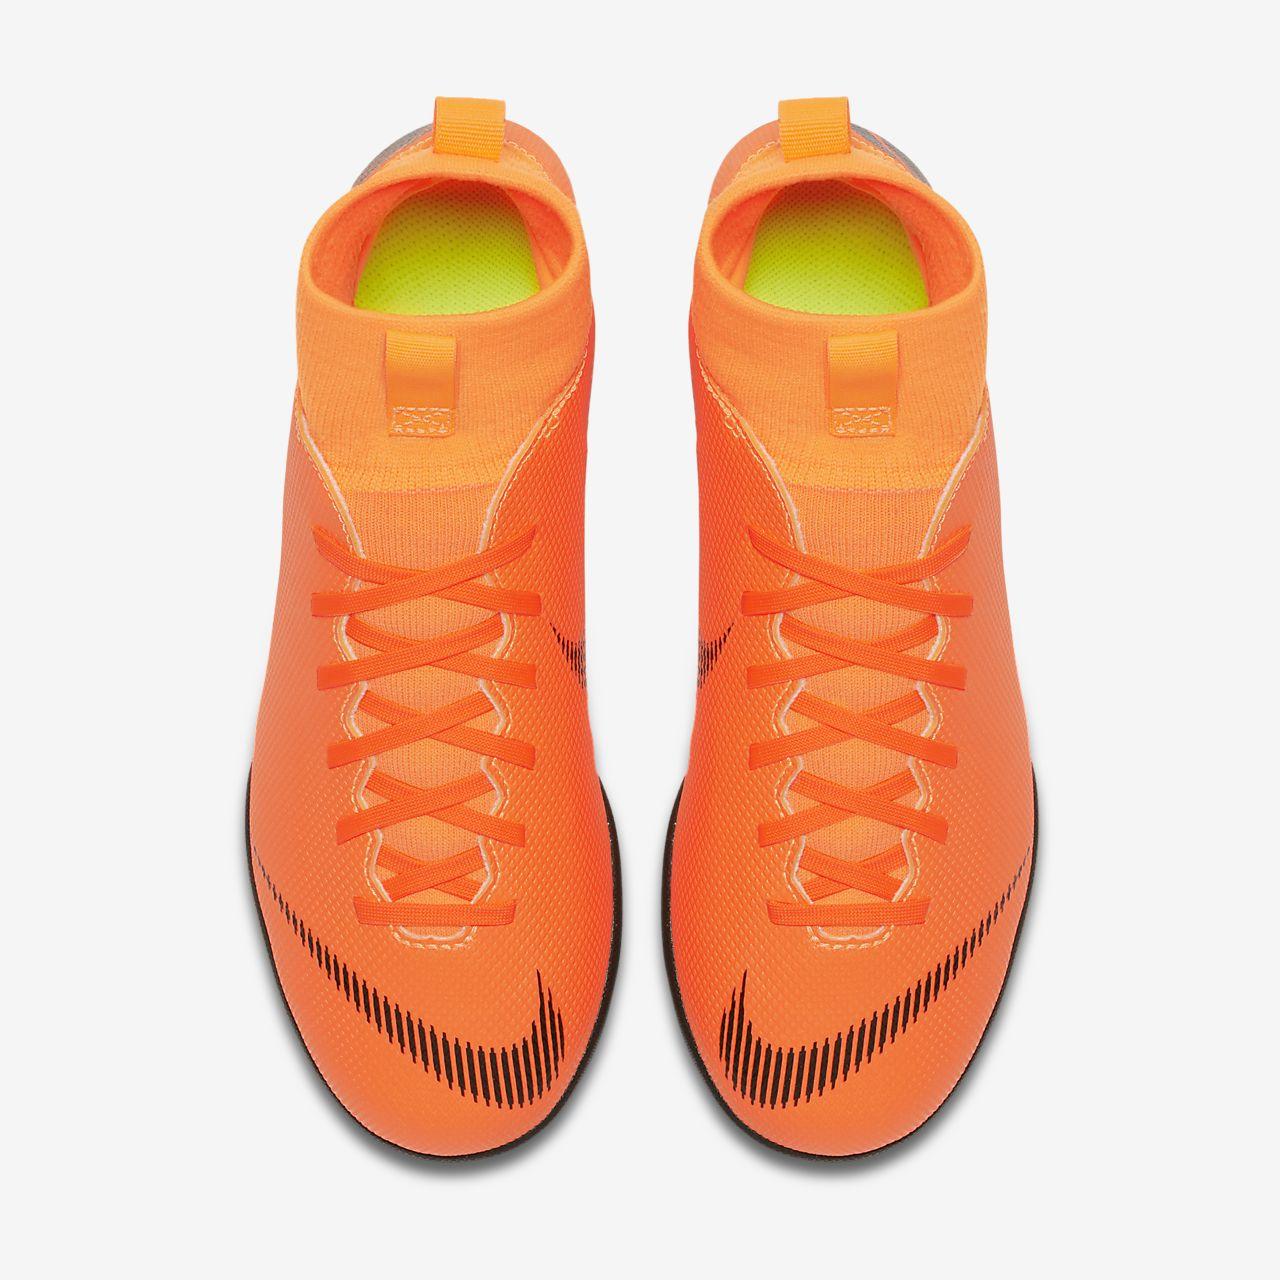 Nike superflyx 6 bambini maschiota maschiota maschiota verde scarpe on vendita 418699